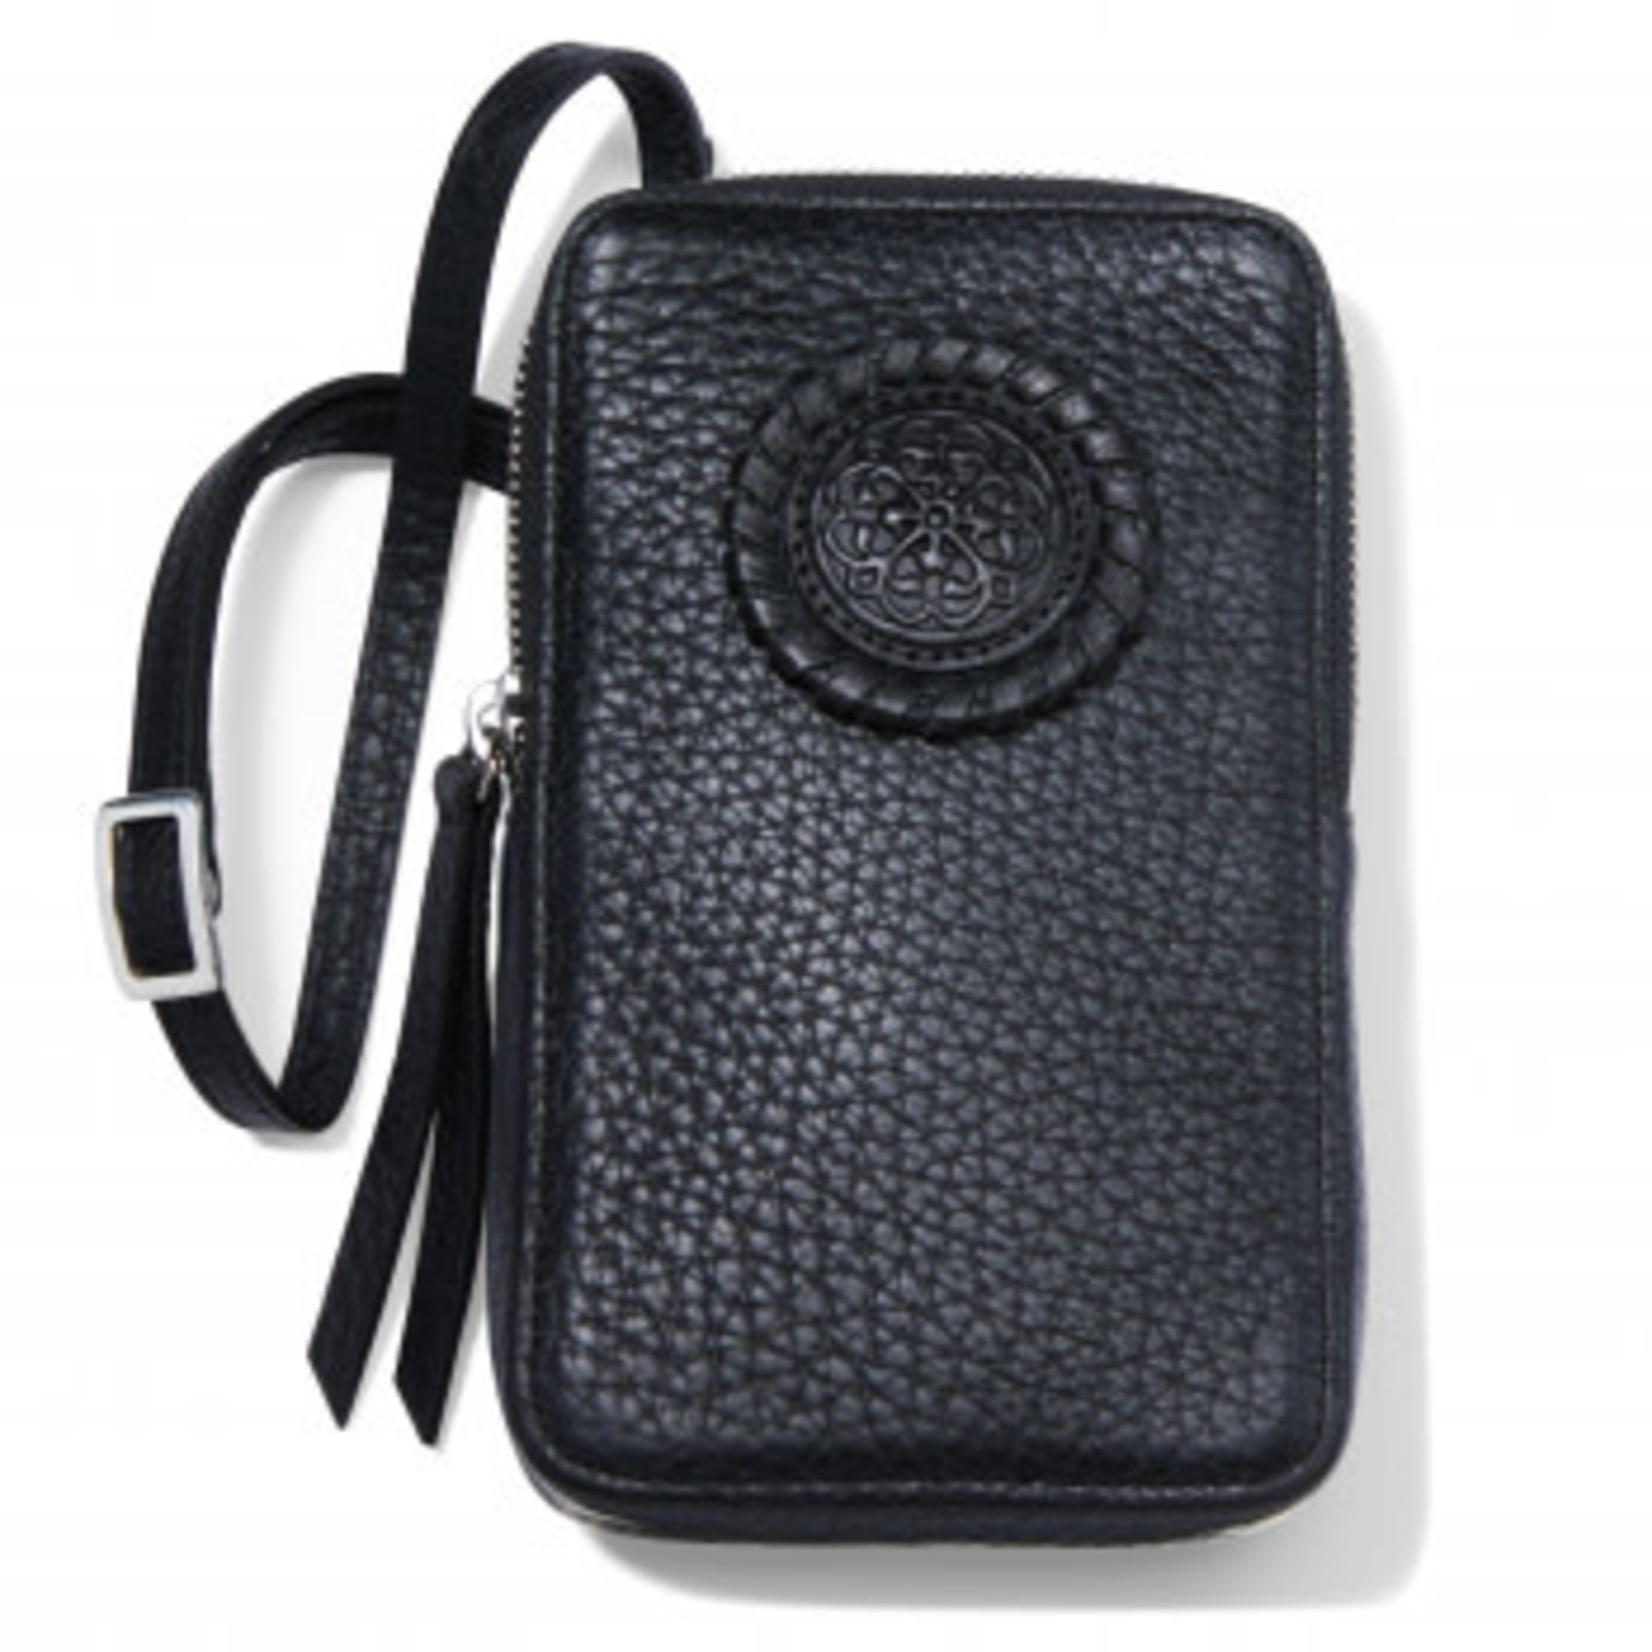 Brighton E53843 Ferrara Zip Around Phone Organizer - Black